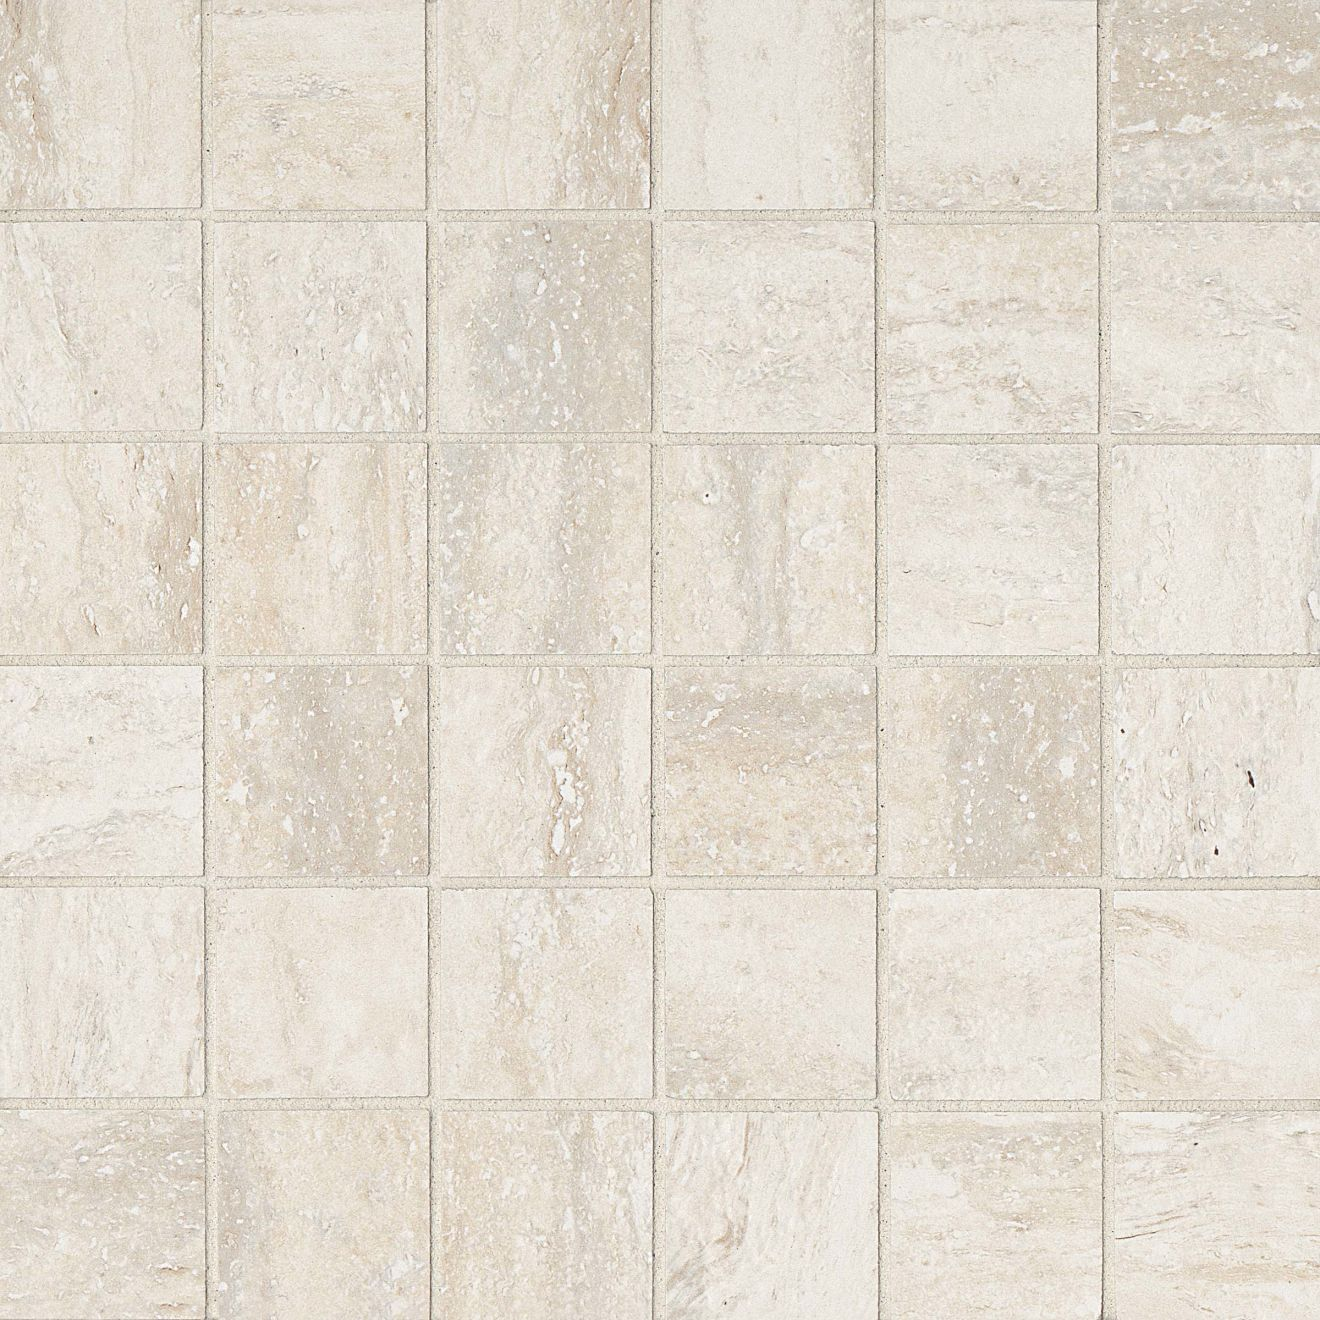 "Toscano 2"" x 2"" Floor & Wall Mosaic in Classico"